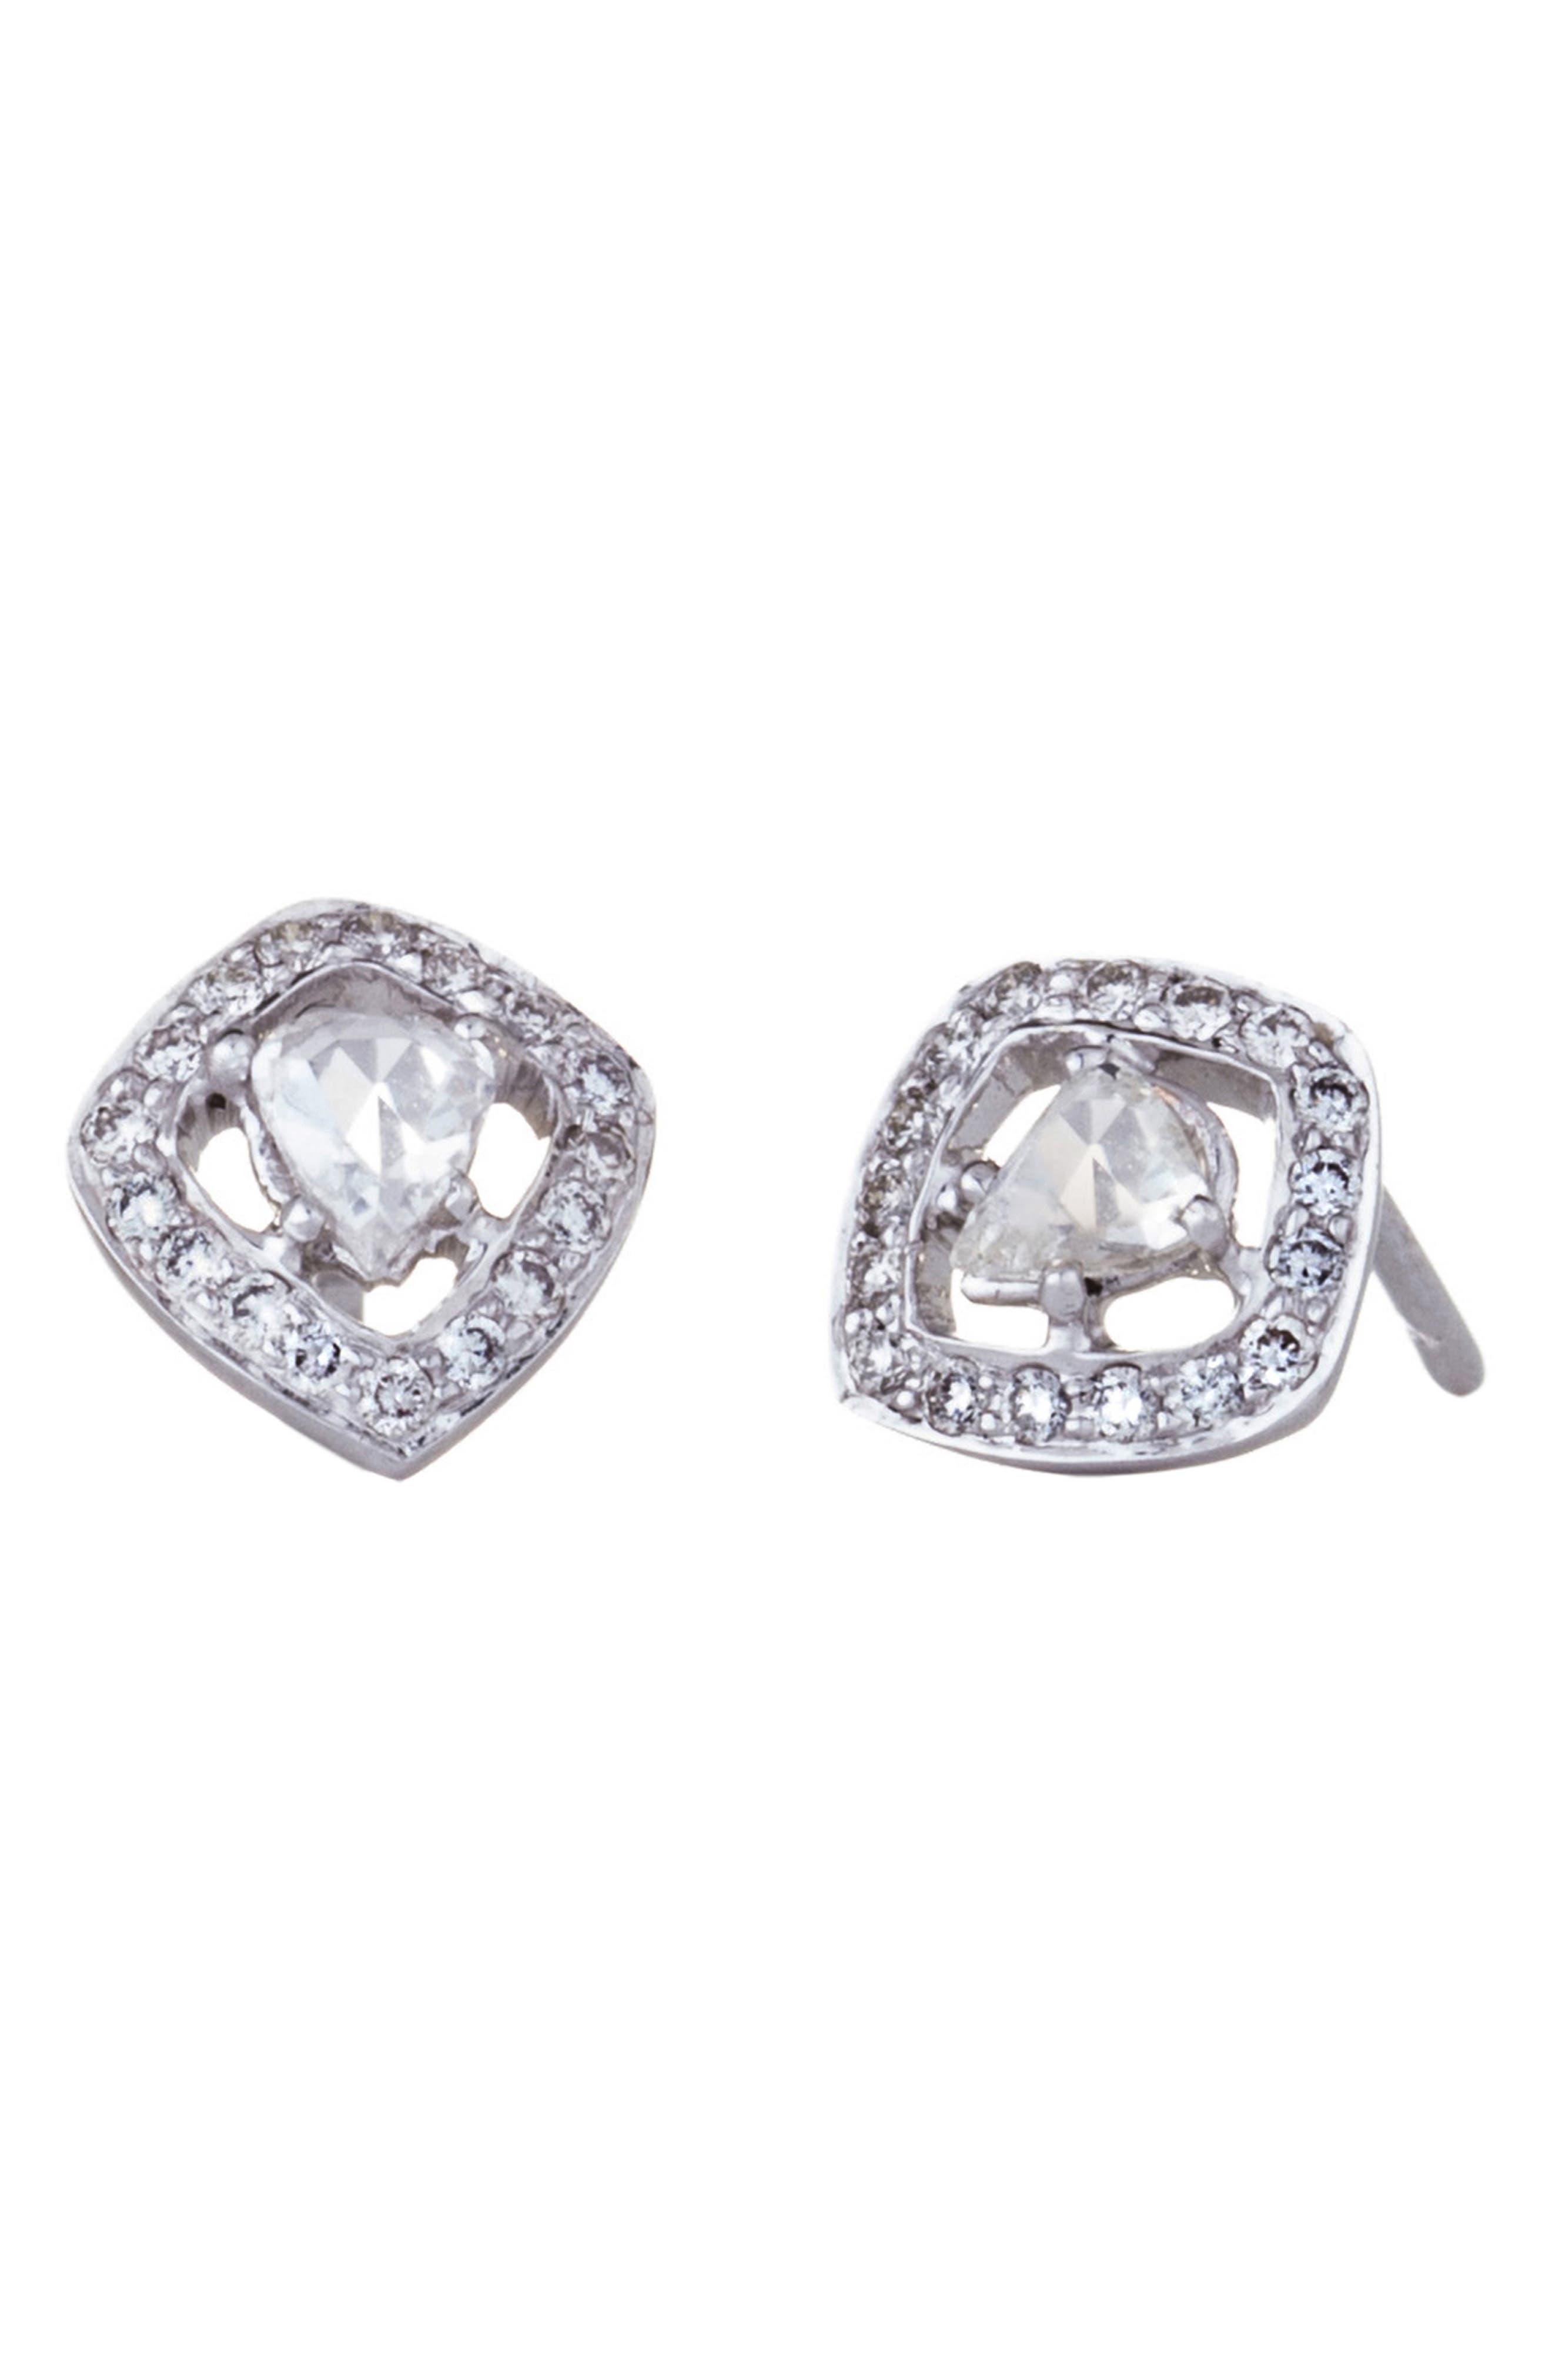 SETHI COUTURE Rose-Cut Diamond Stud Earrings in White Gold/ Diamond